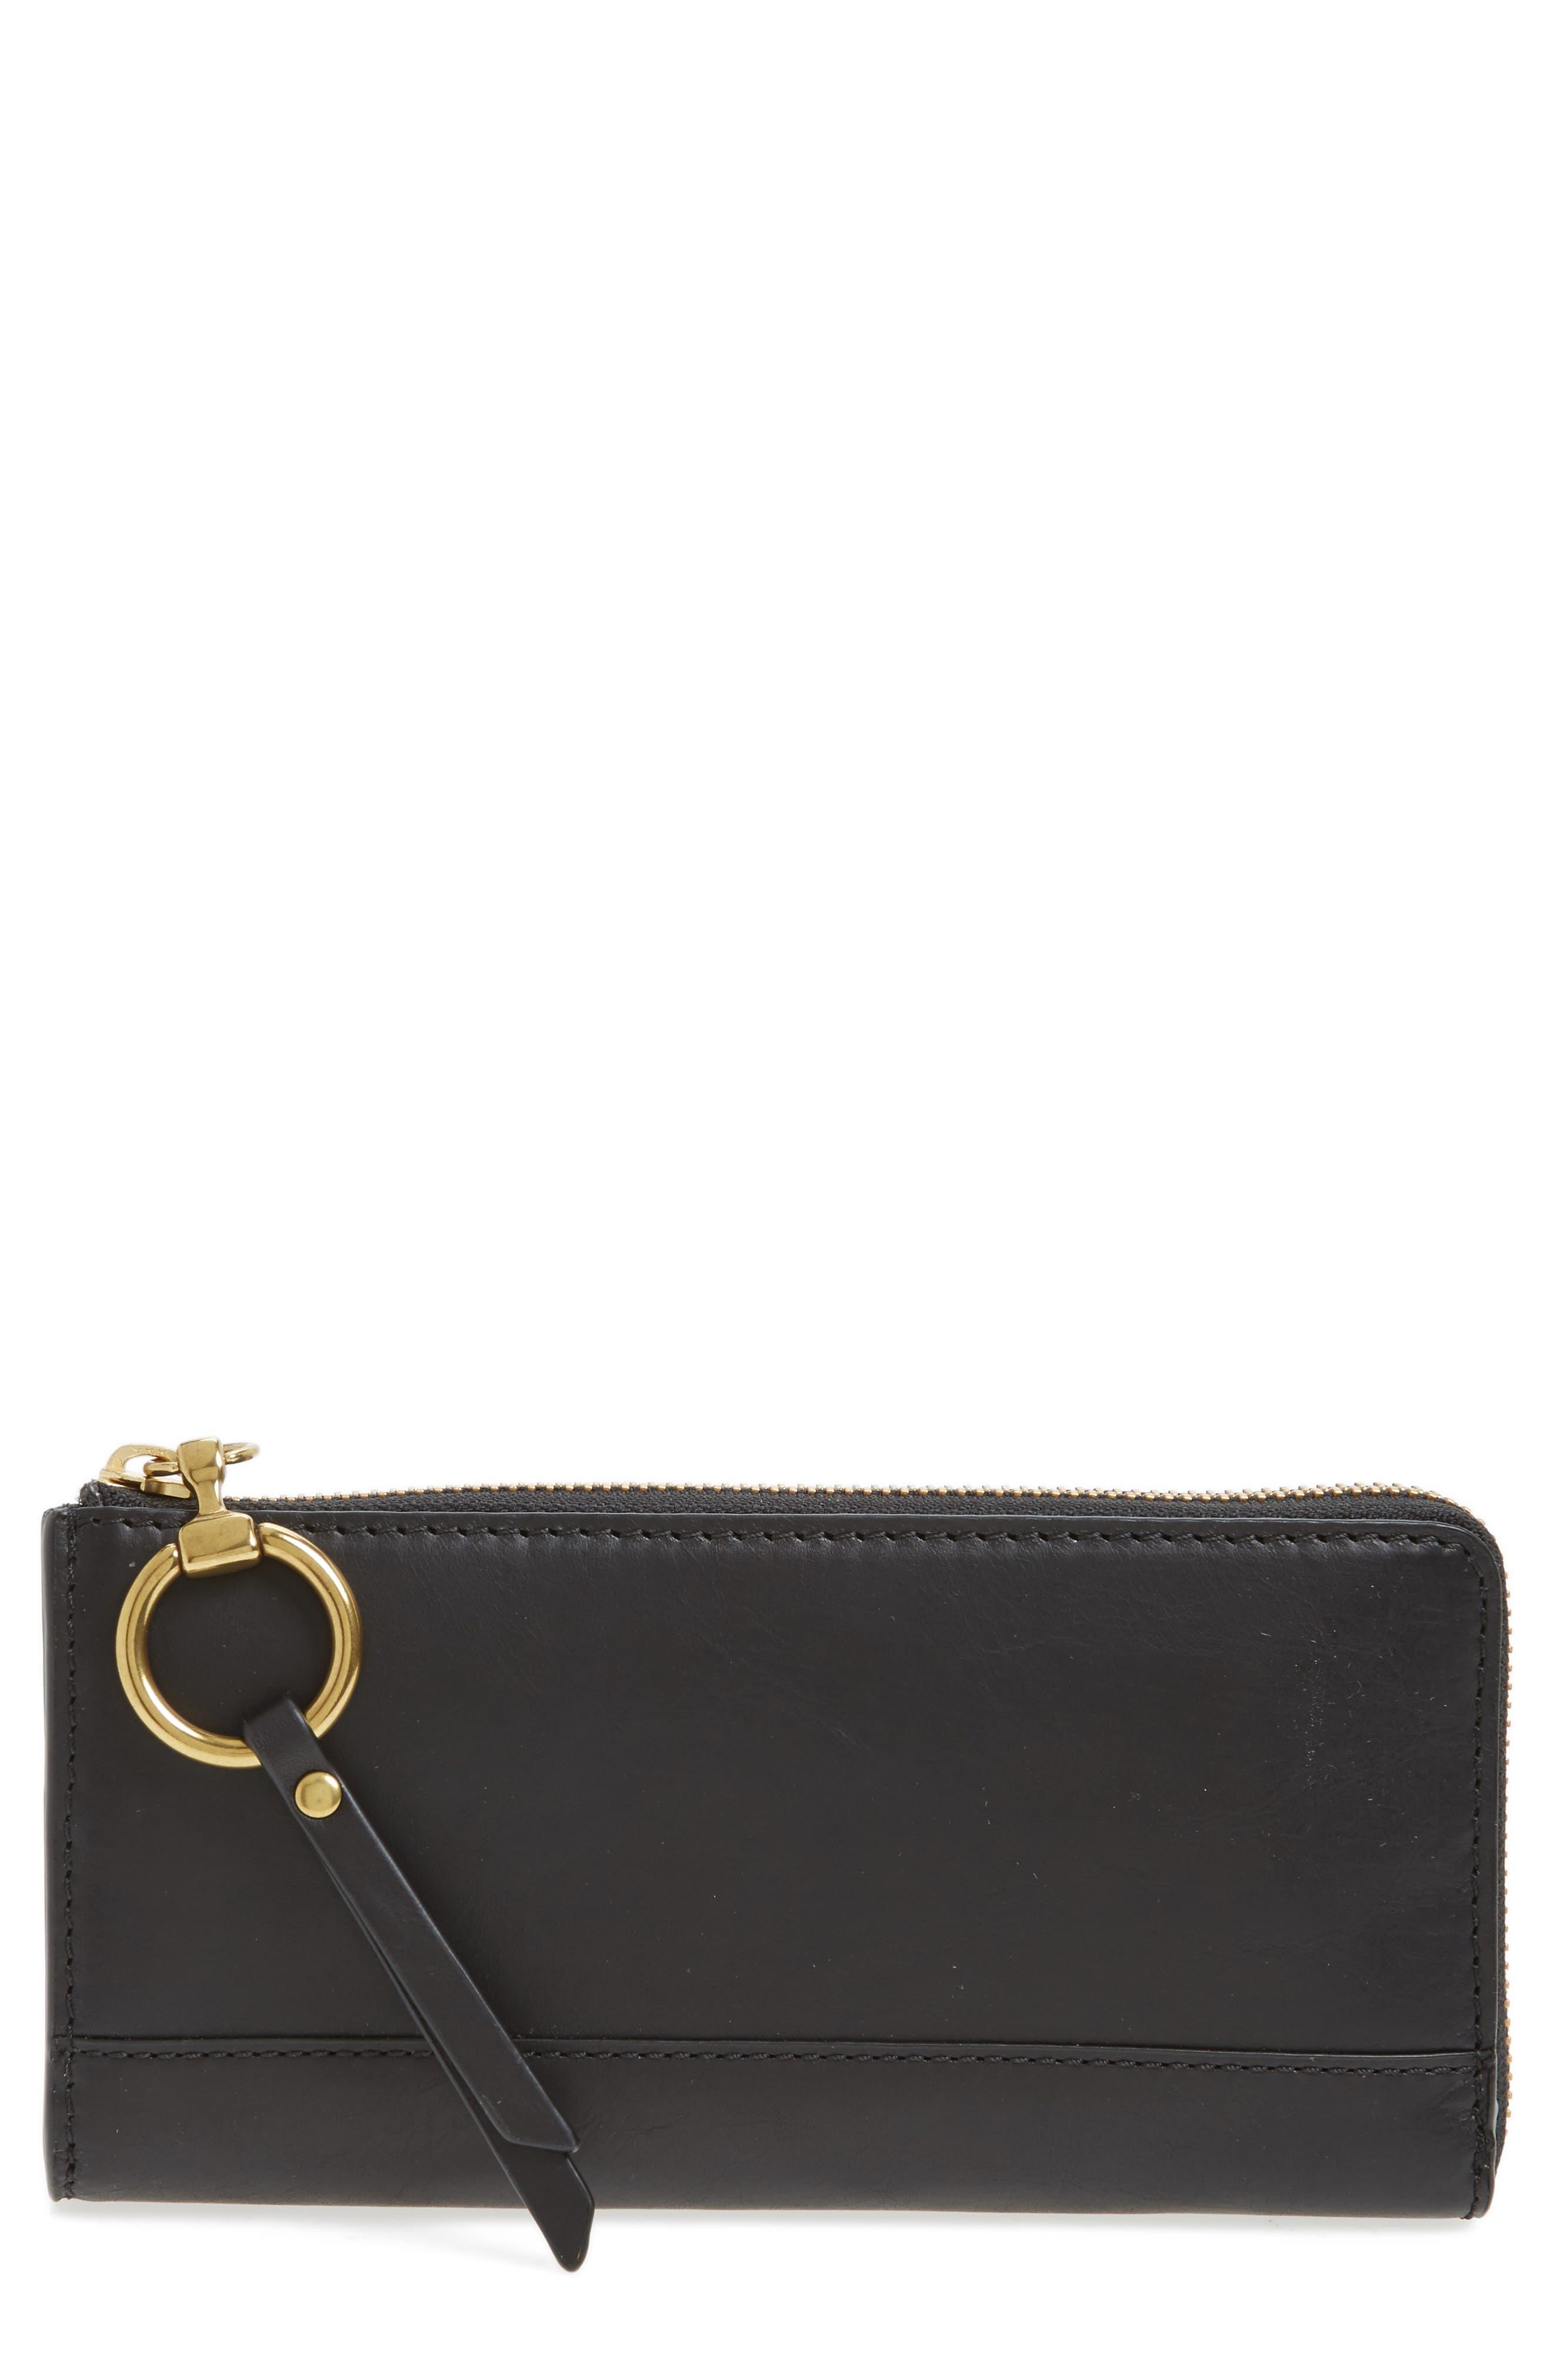 Main Image - Frye Large Ilana Harness Leather Zip Wallet